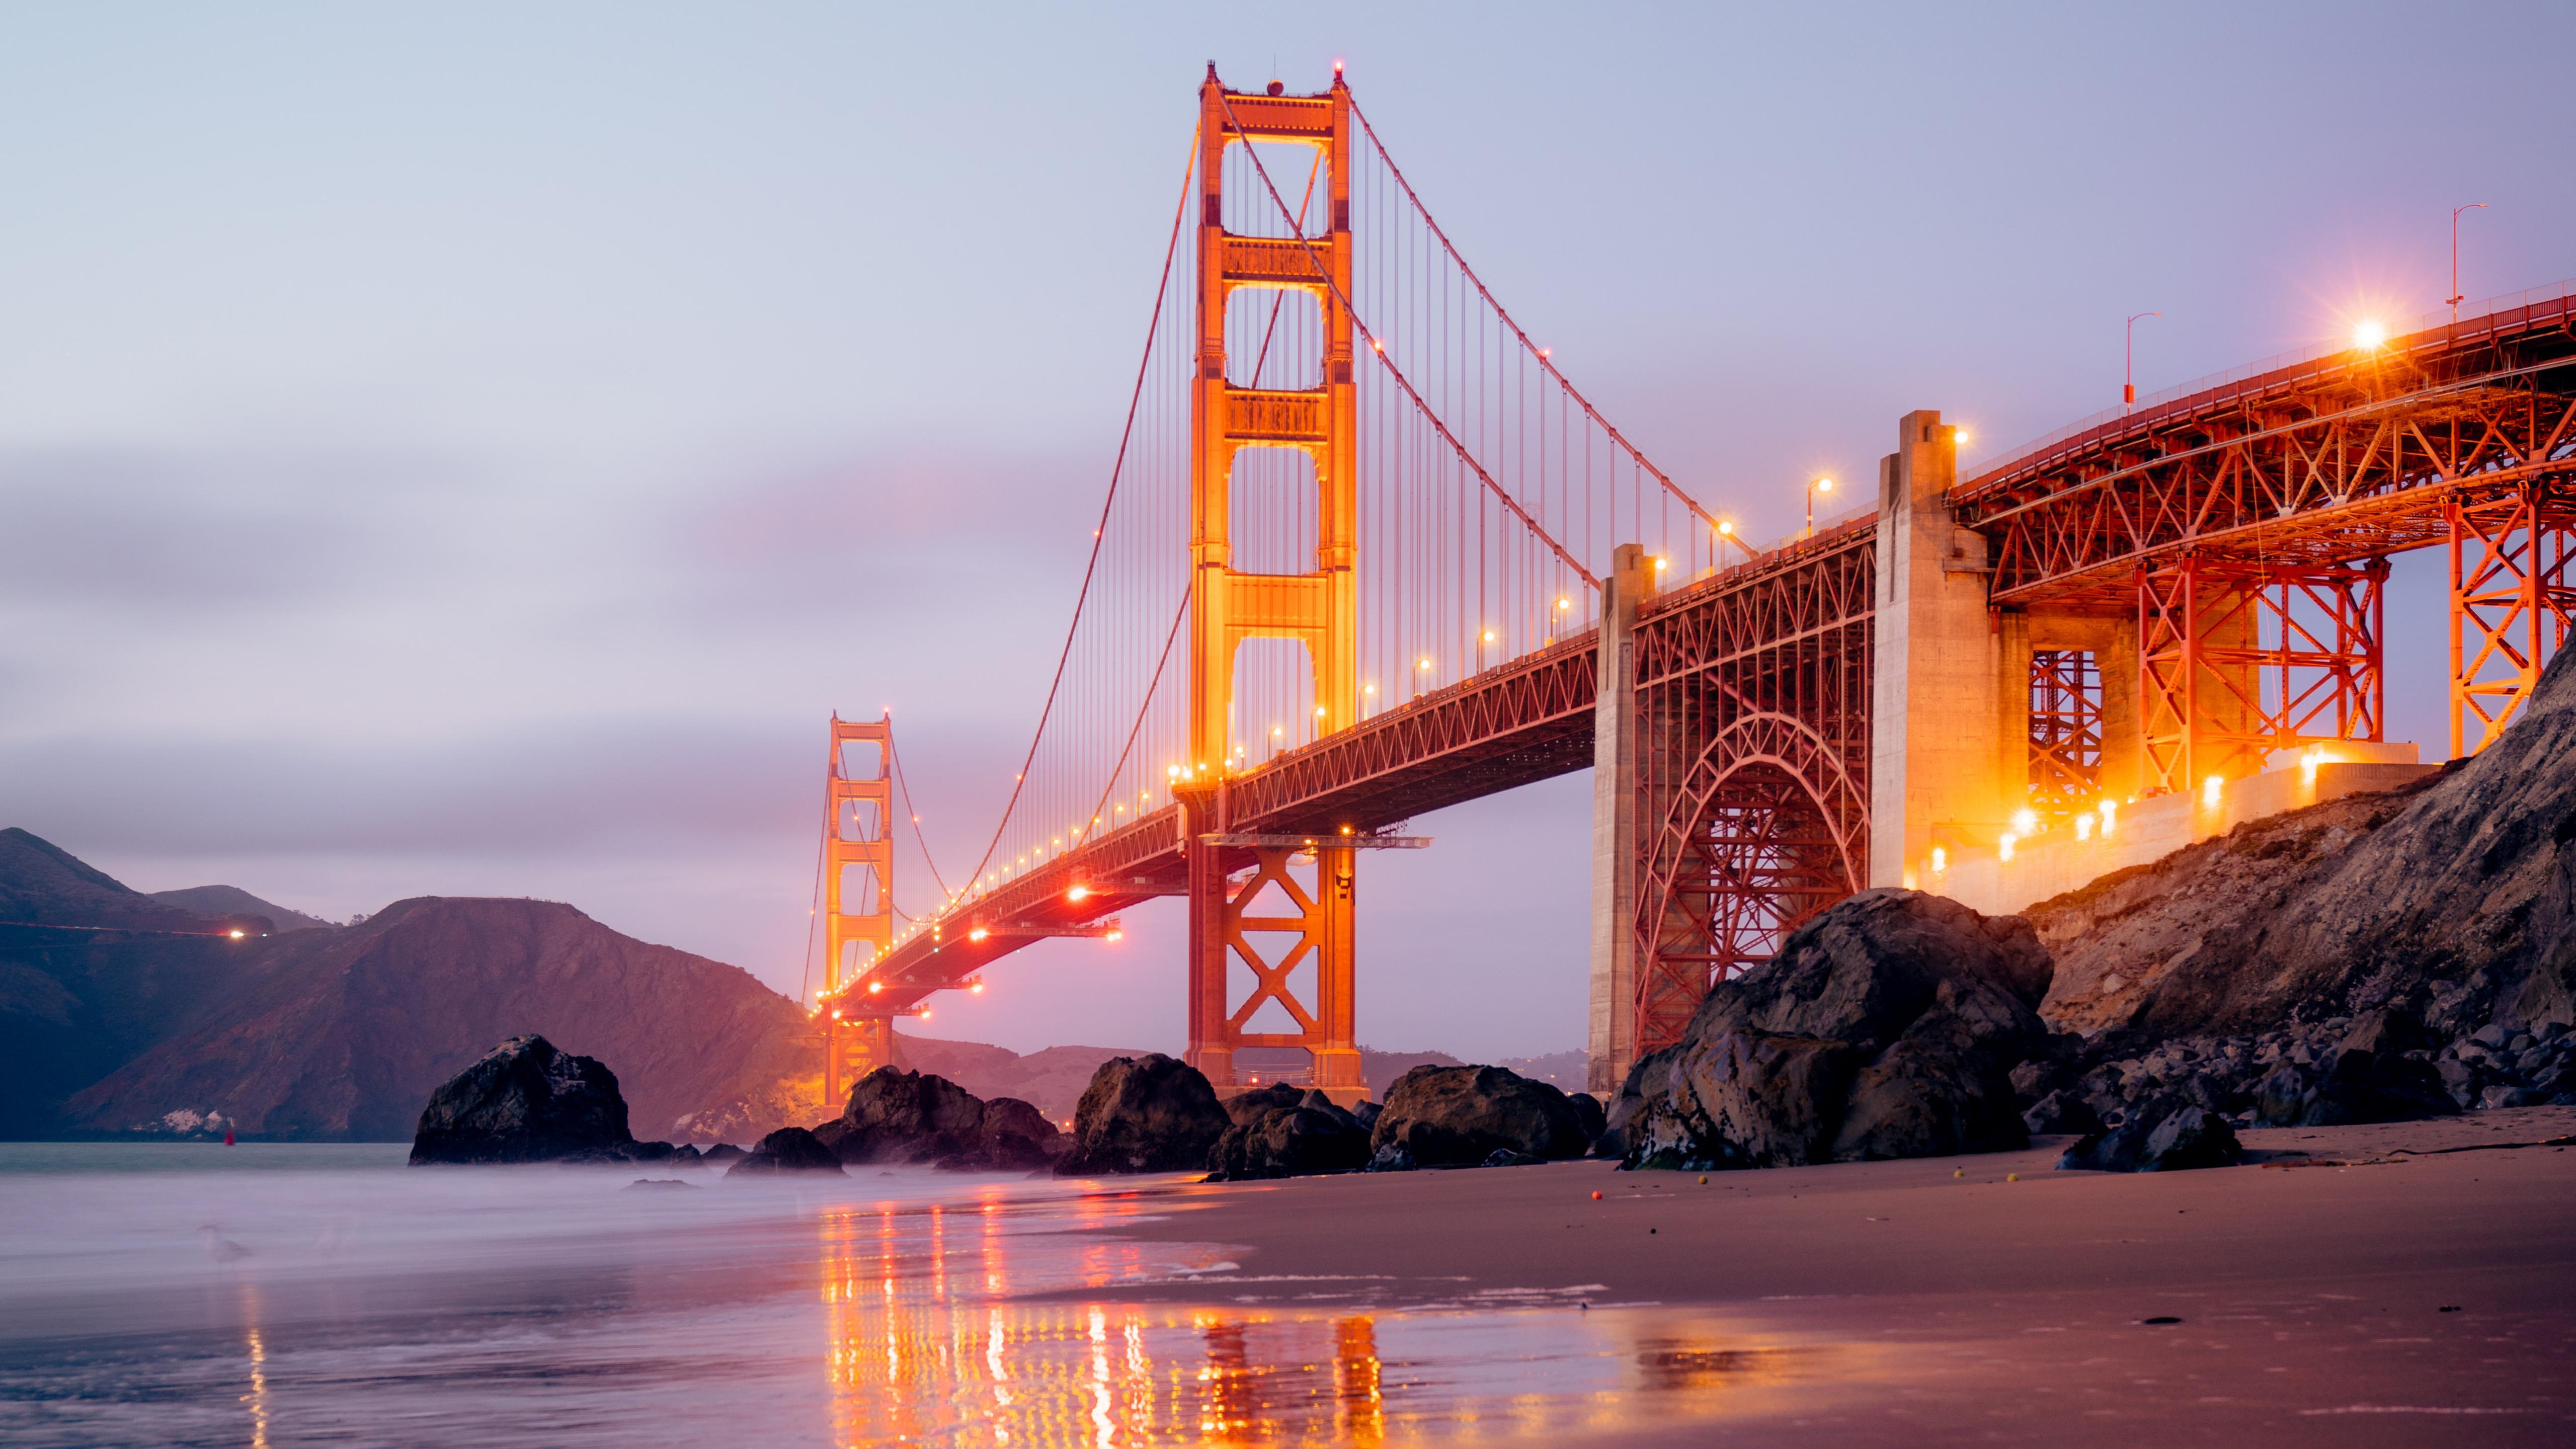 Golden Gate Bridge San Francisco 5k Retina Ultra Hd Wallpaper Background Image 5120x2880 Id 1052036 Wallpaper Abyss